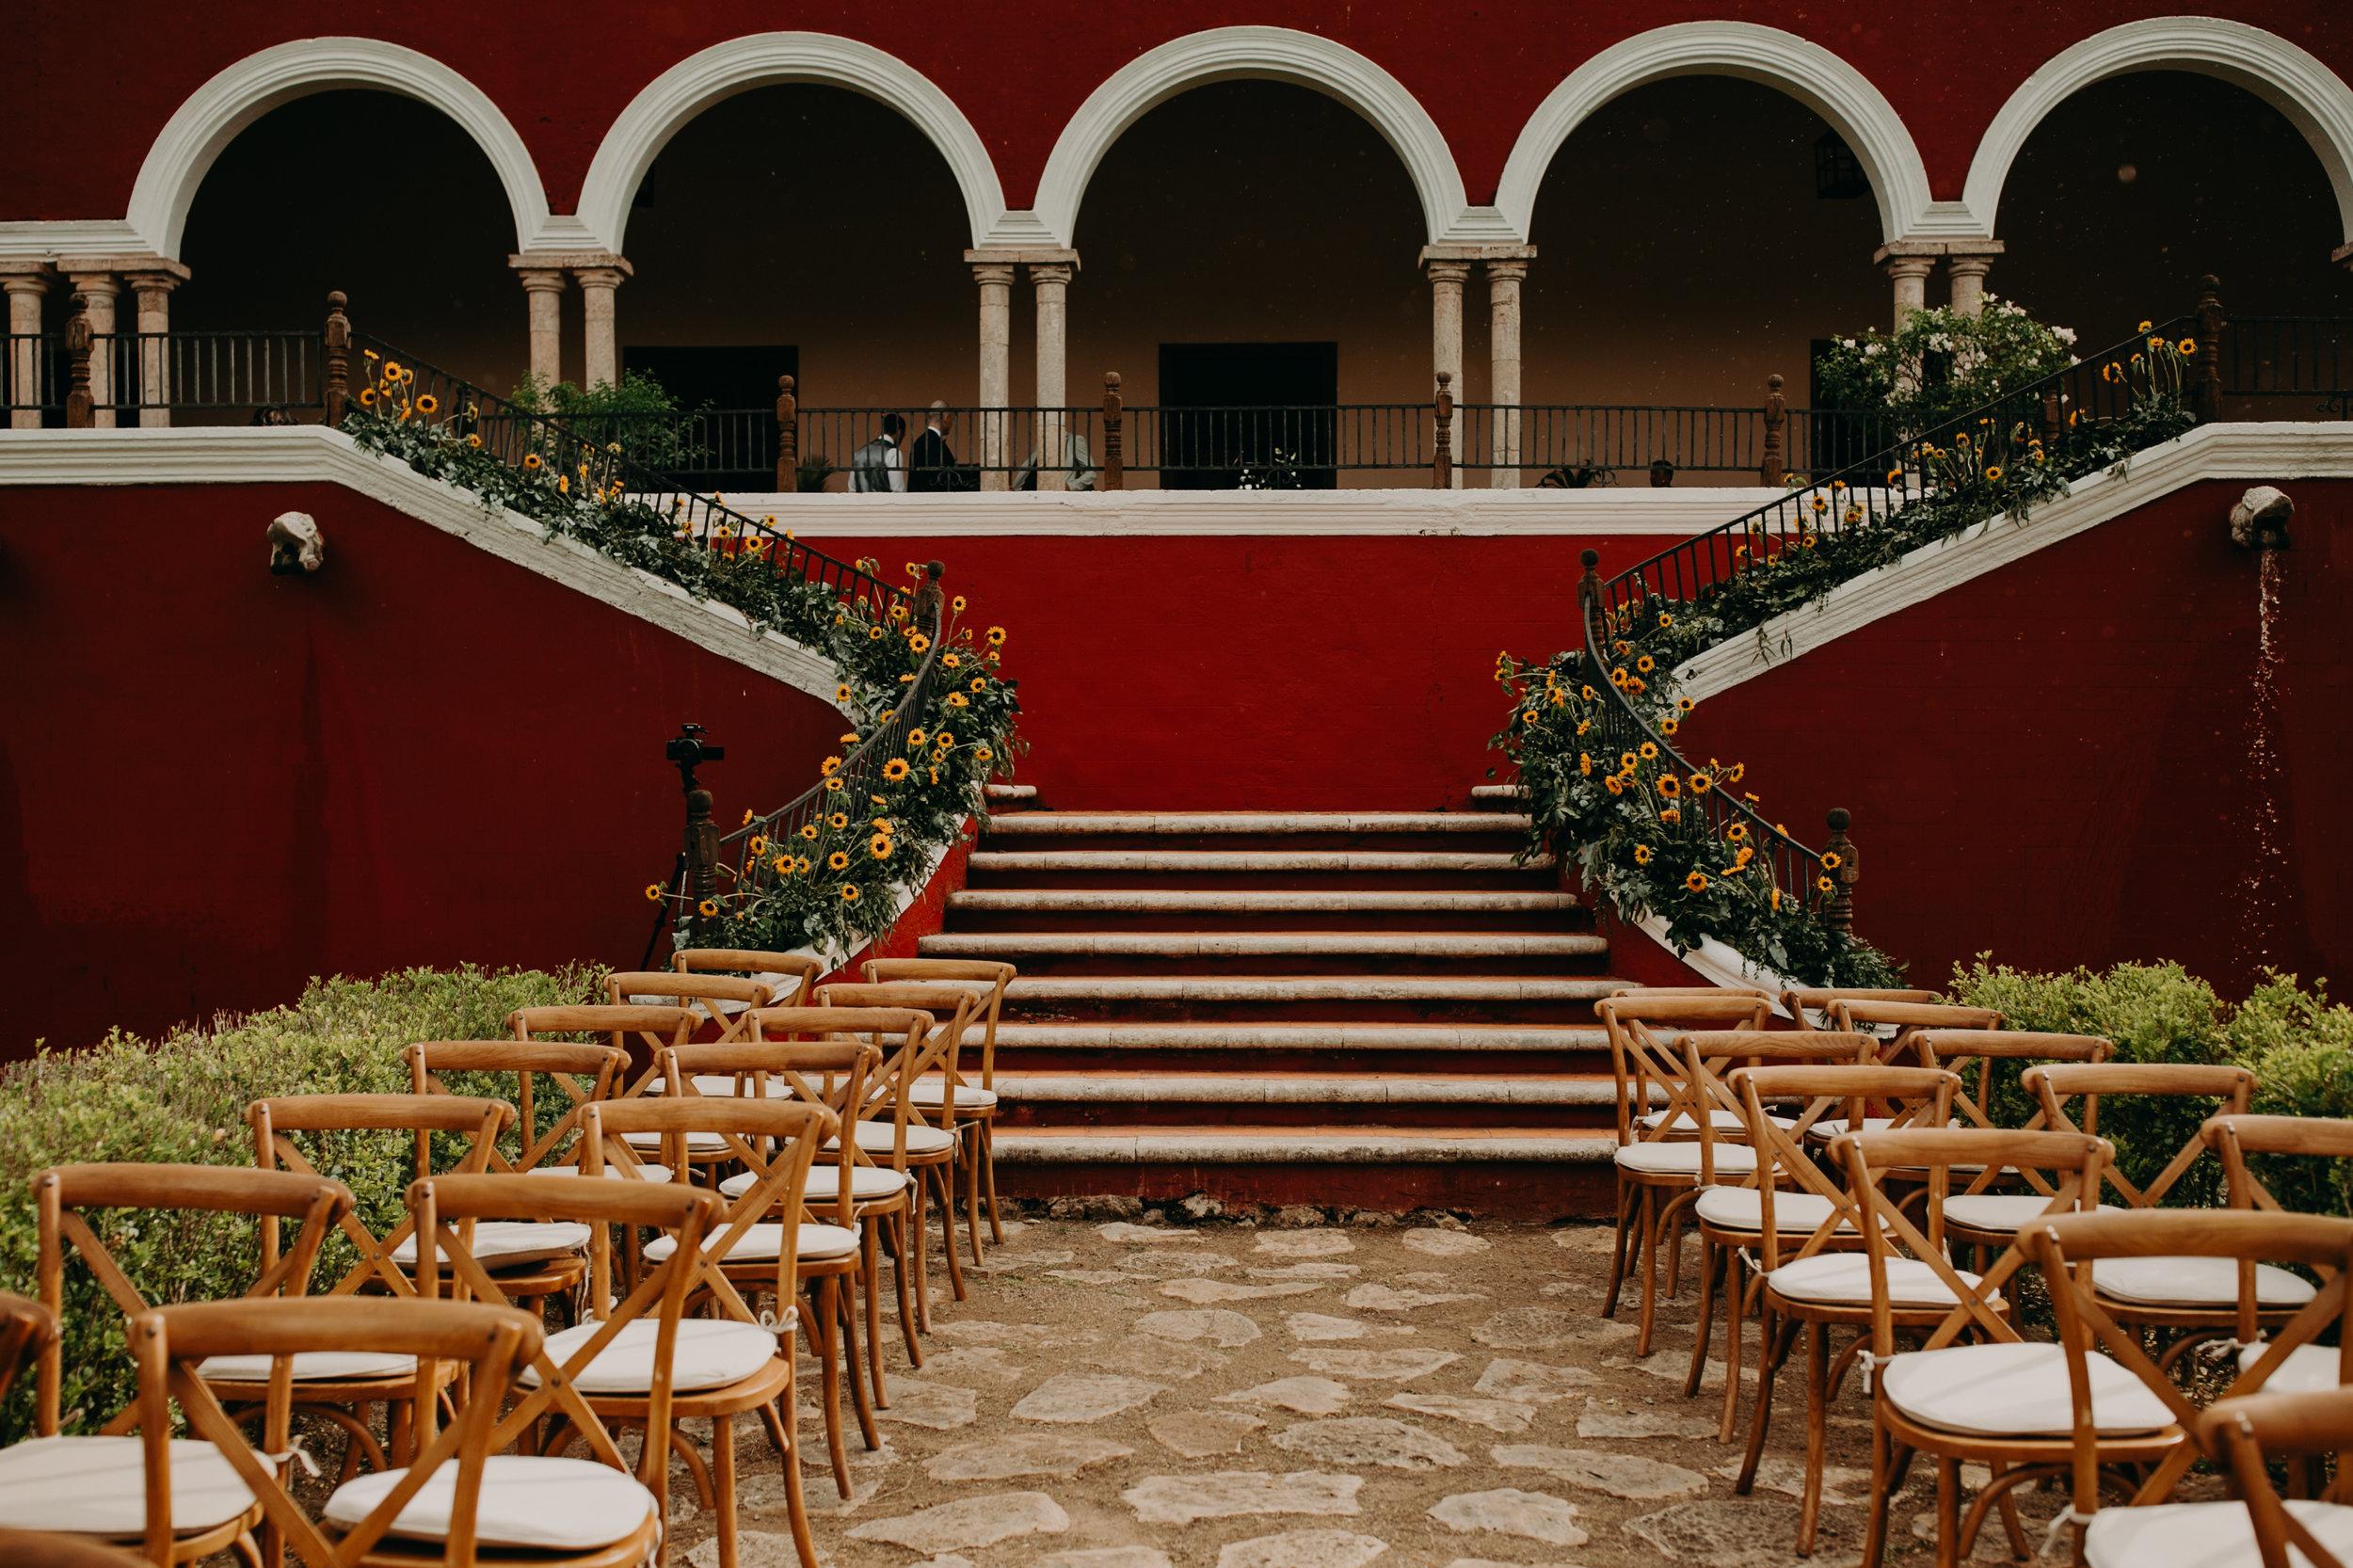 Hacienda Temozon Yucatan Mexico Wedding | Ida & Peter Emily Magers Photography-881.jpg